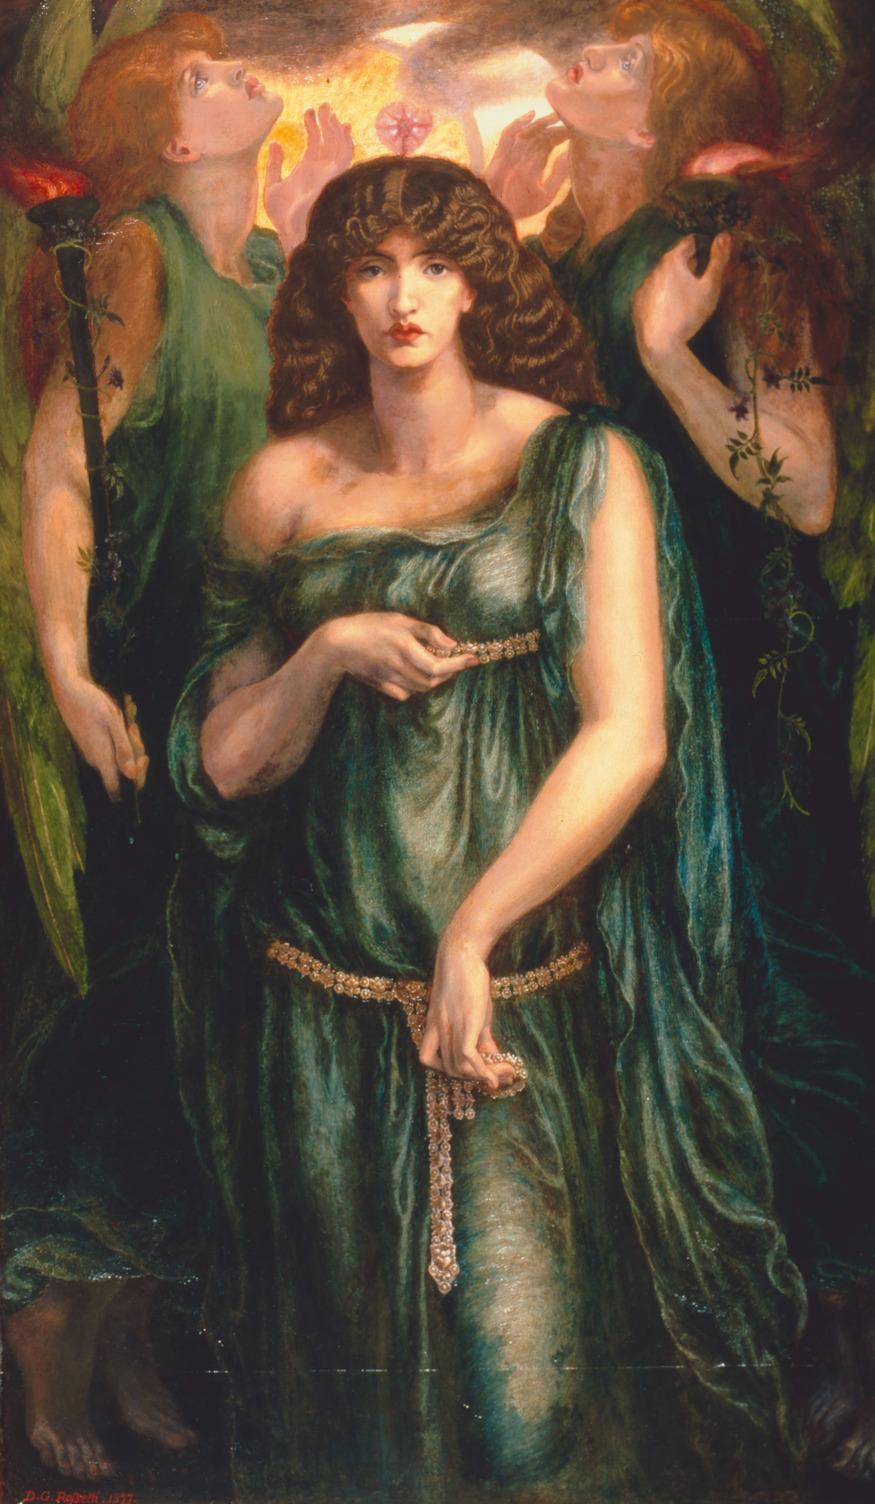 Dante Gabriel Rossetti, Astarte Syriaca 1877. Dante Gabriel Rossetti, Astarte Syriaca 1877 Copyright Manchester City Galleries